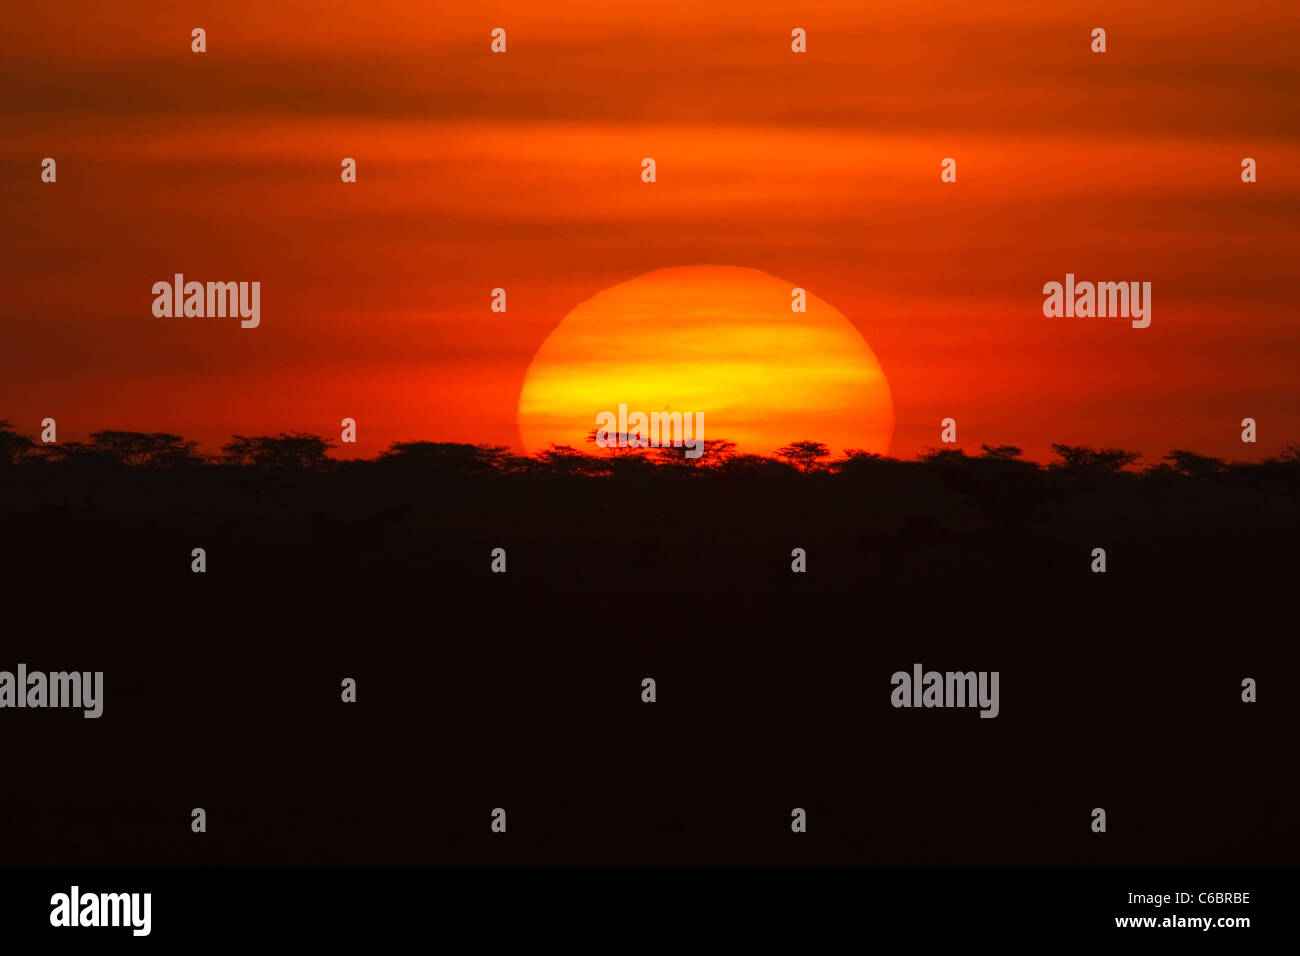 Sunset over savanna Ethiopia. - Stock Image